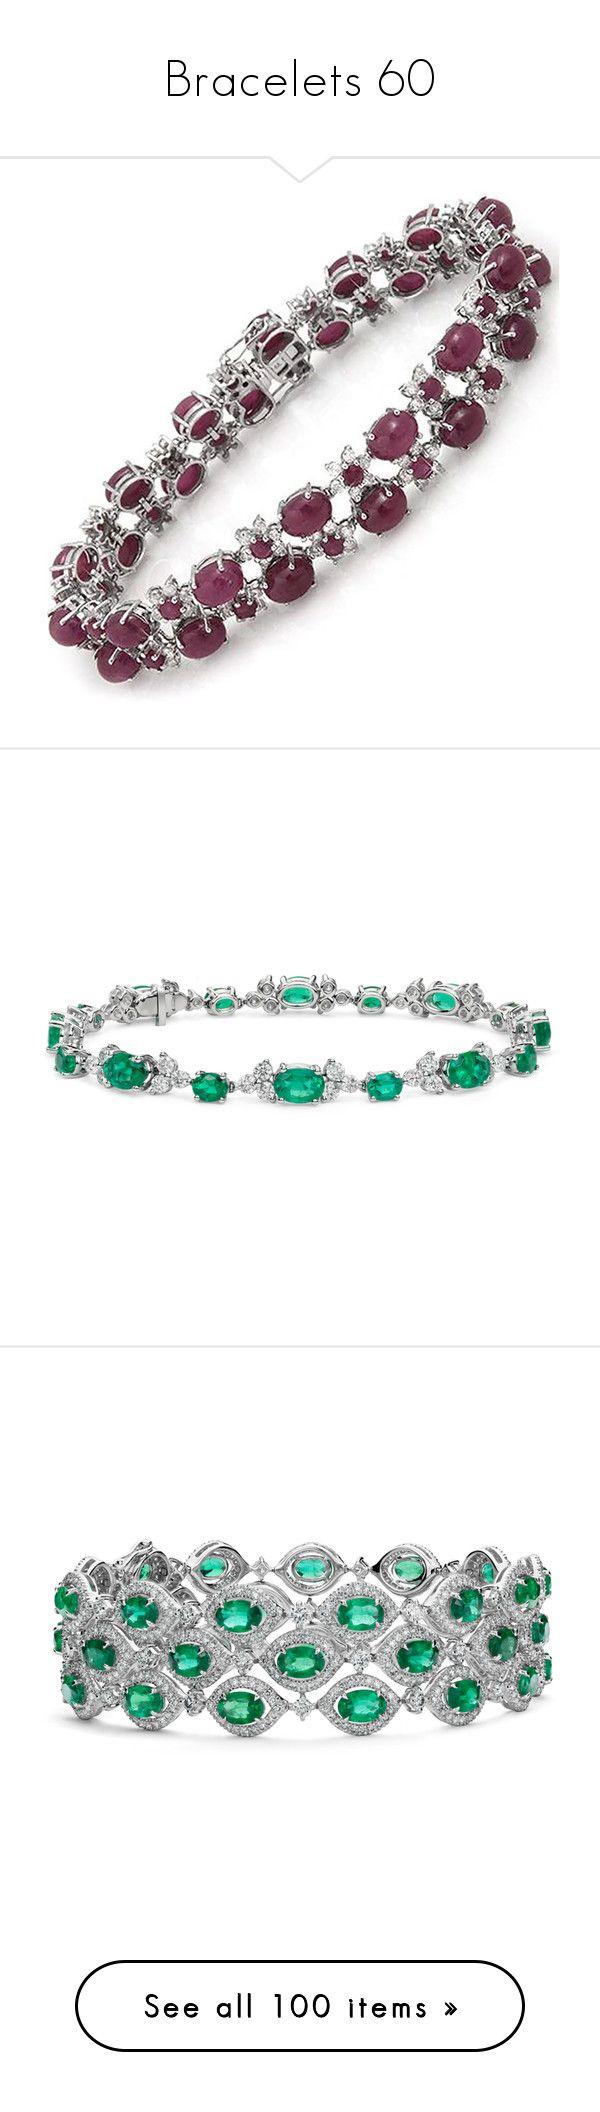 """Bracelets 60"" by singlemom ❤ liked on Polyvore featuring jewelry, bracelets, gold diamond jewelry, diamond bangles, 14k yellow gold jewelry, ruby bangles, yellow gold jewelry, rannekorut, necklaces and emerald jewellery"